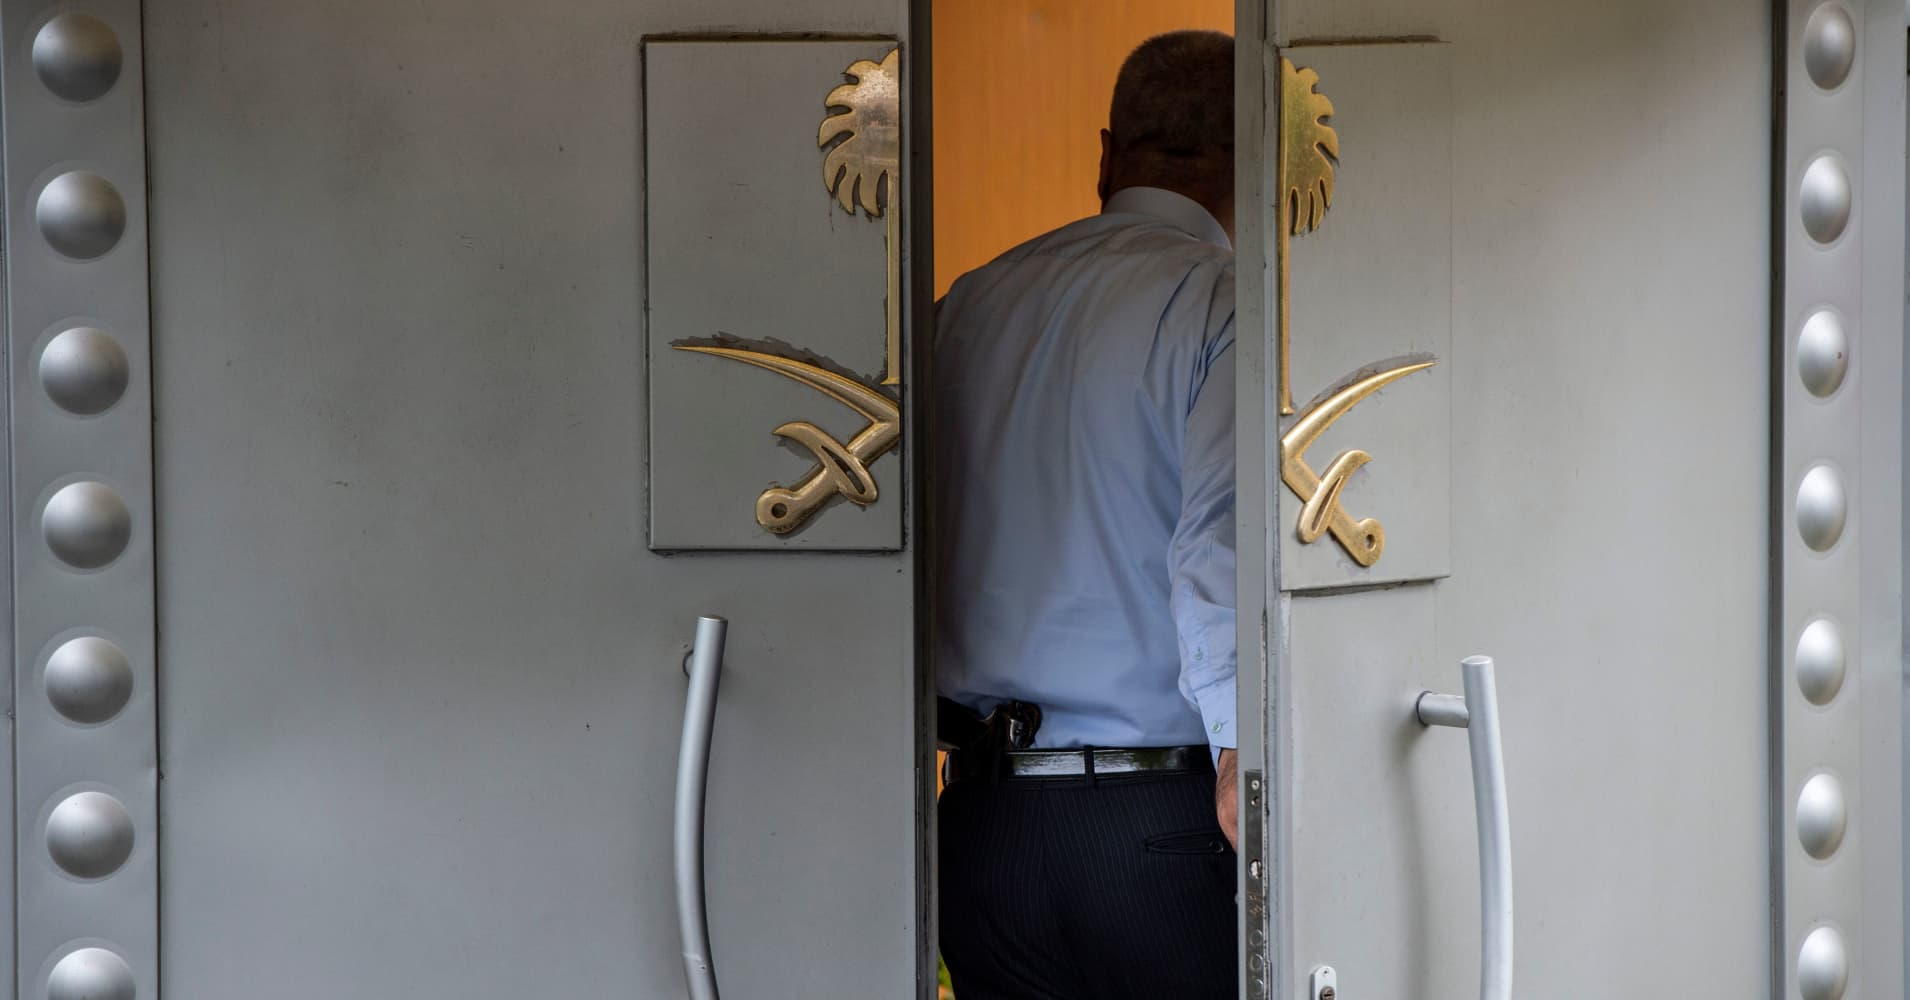 Saudi stocks plunge on Khashoggi fallout; biggest drop since 2014